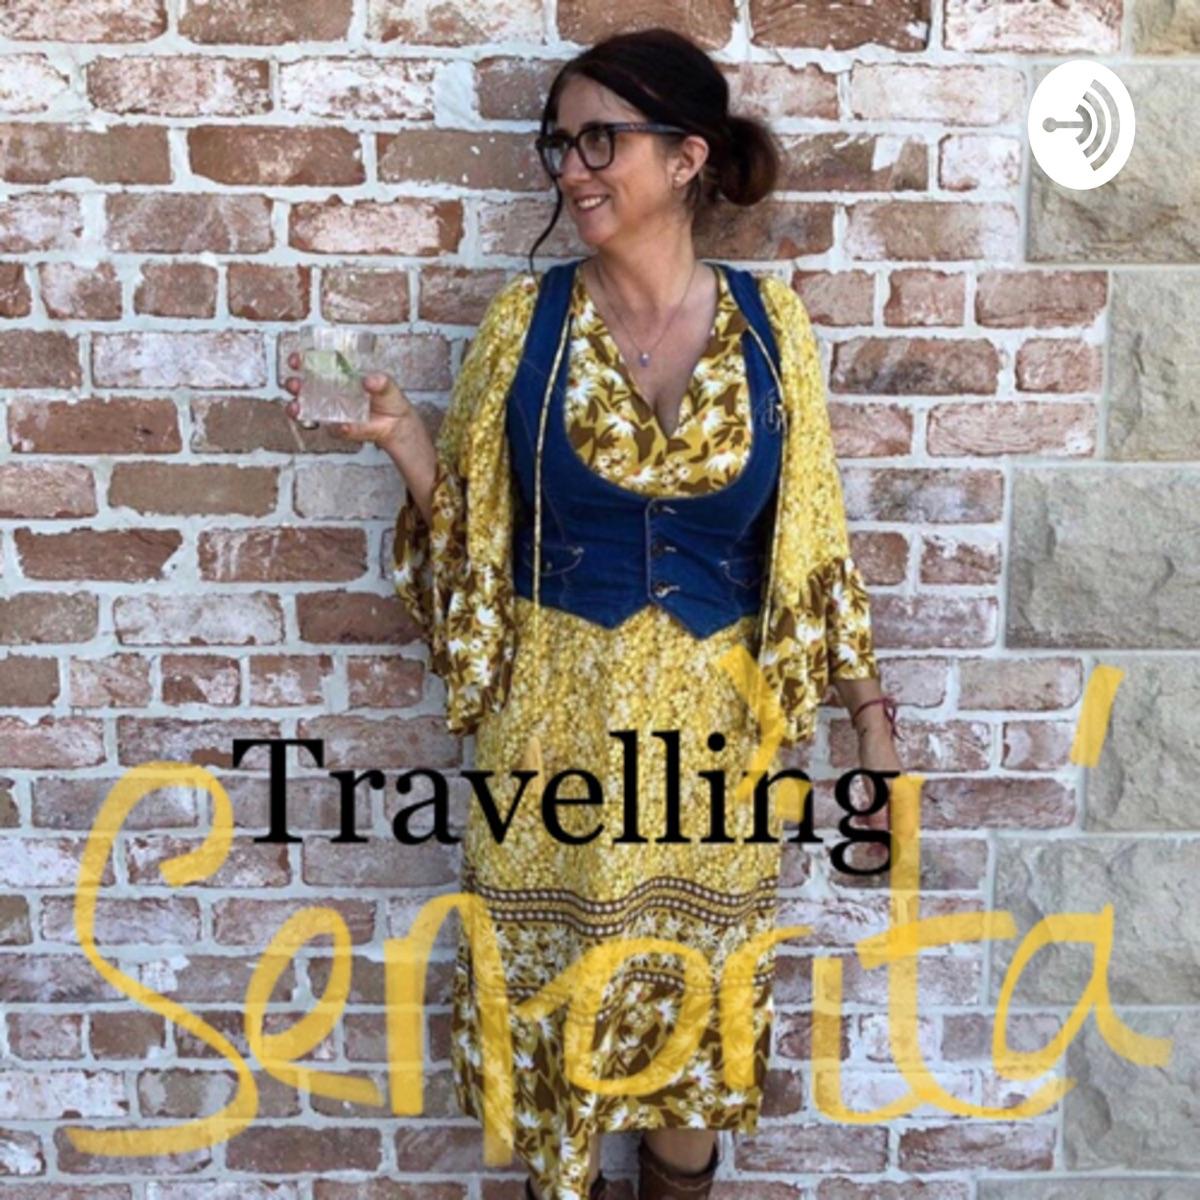 Travelling Señorita